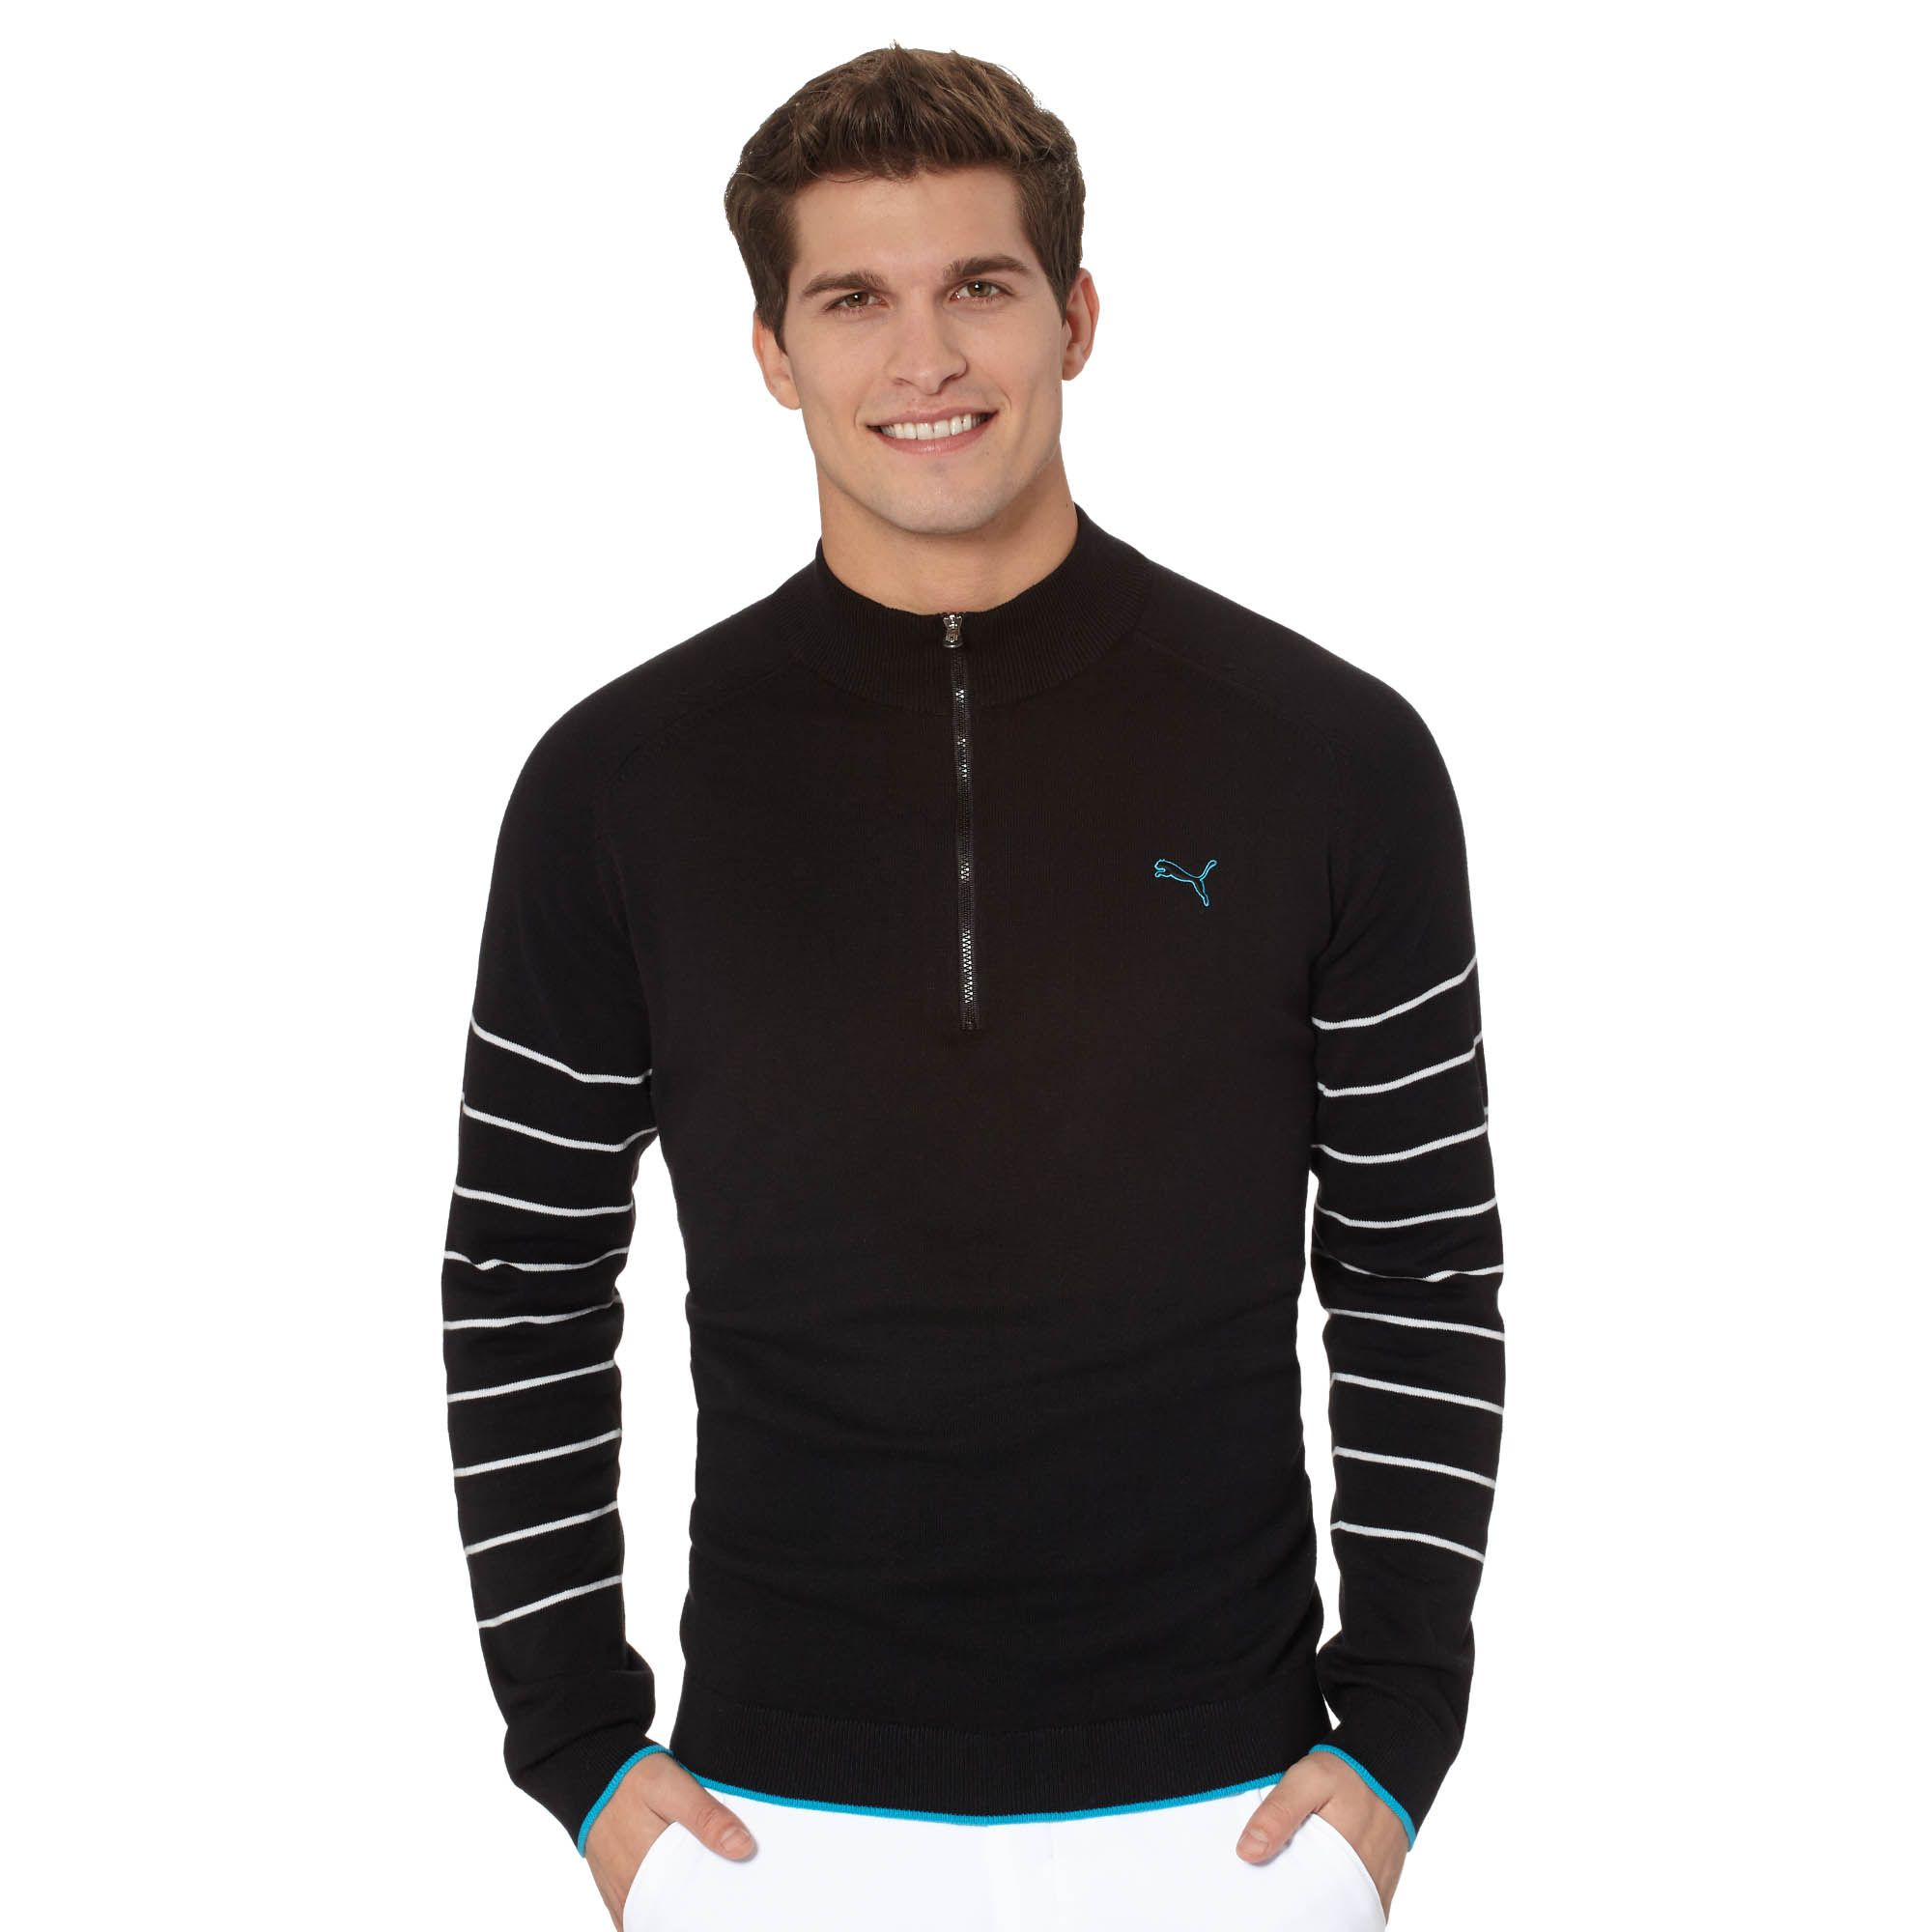 Image of 1/4 Zip Novelty Golf Sweater